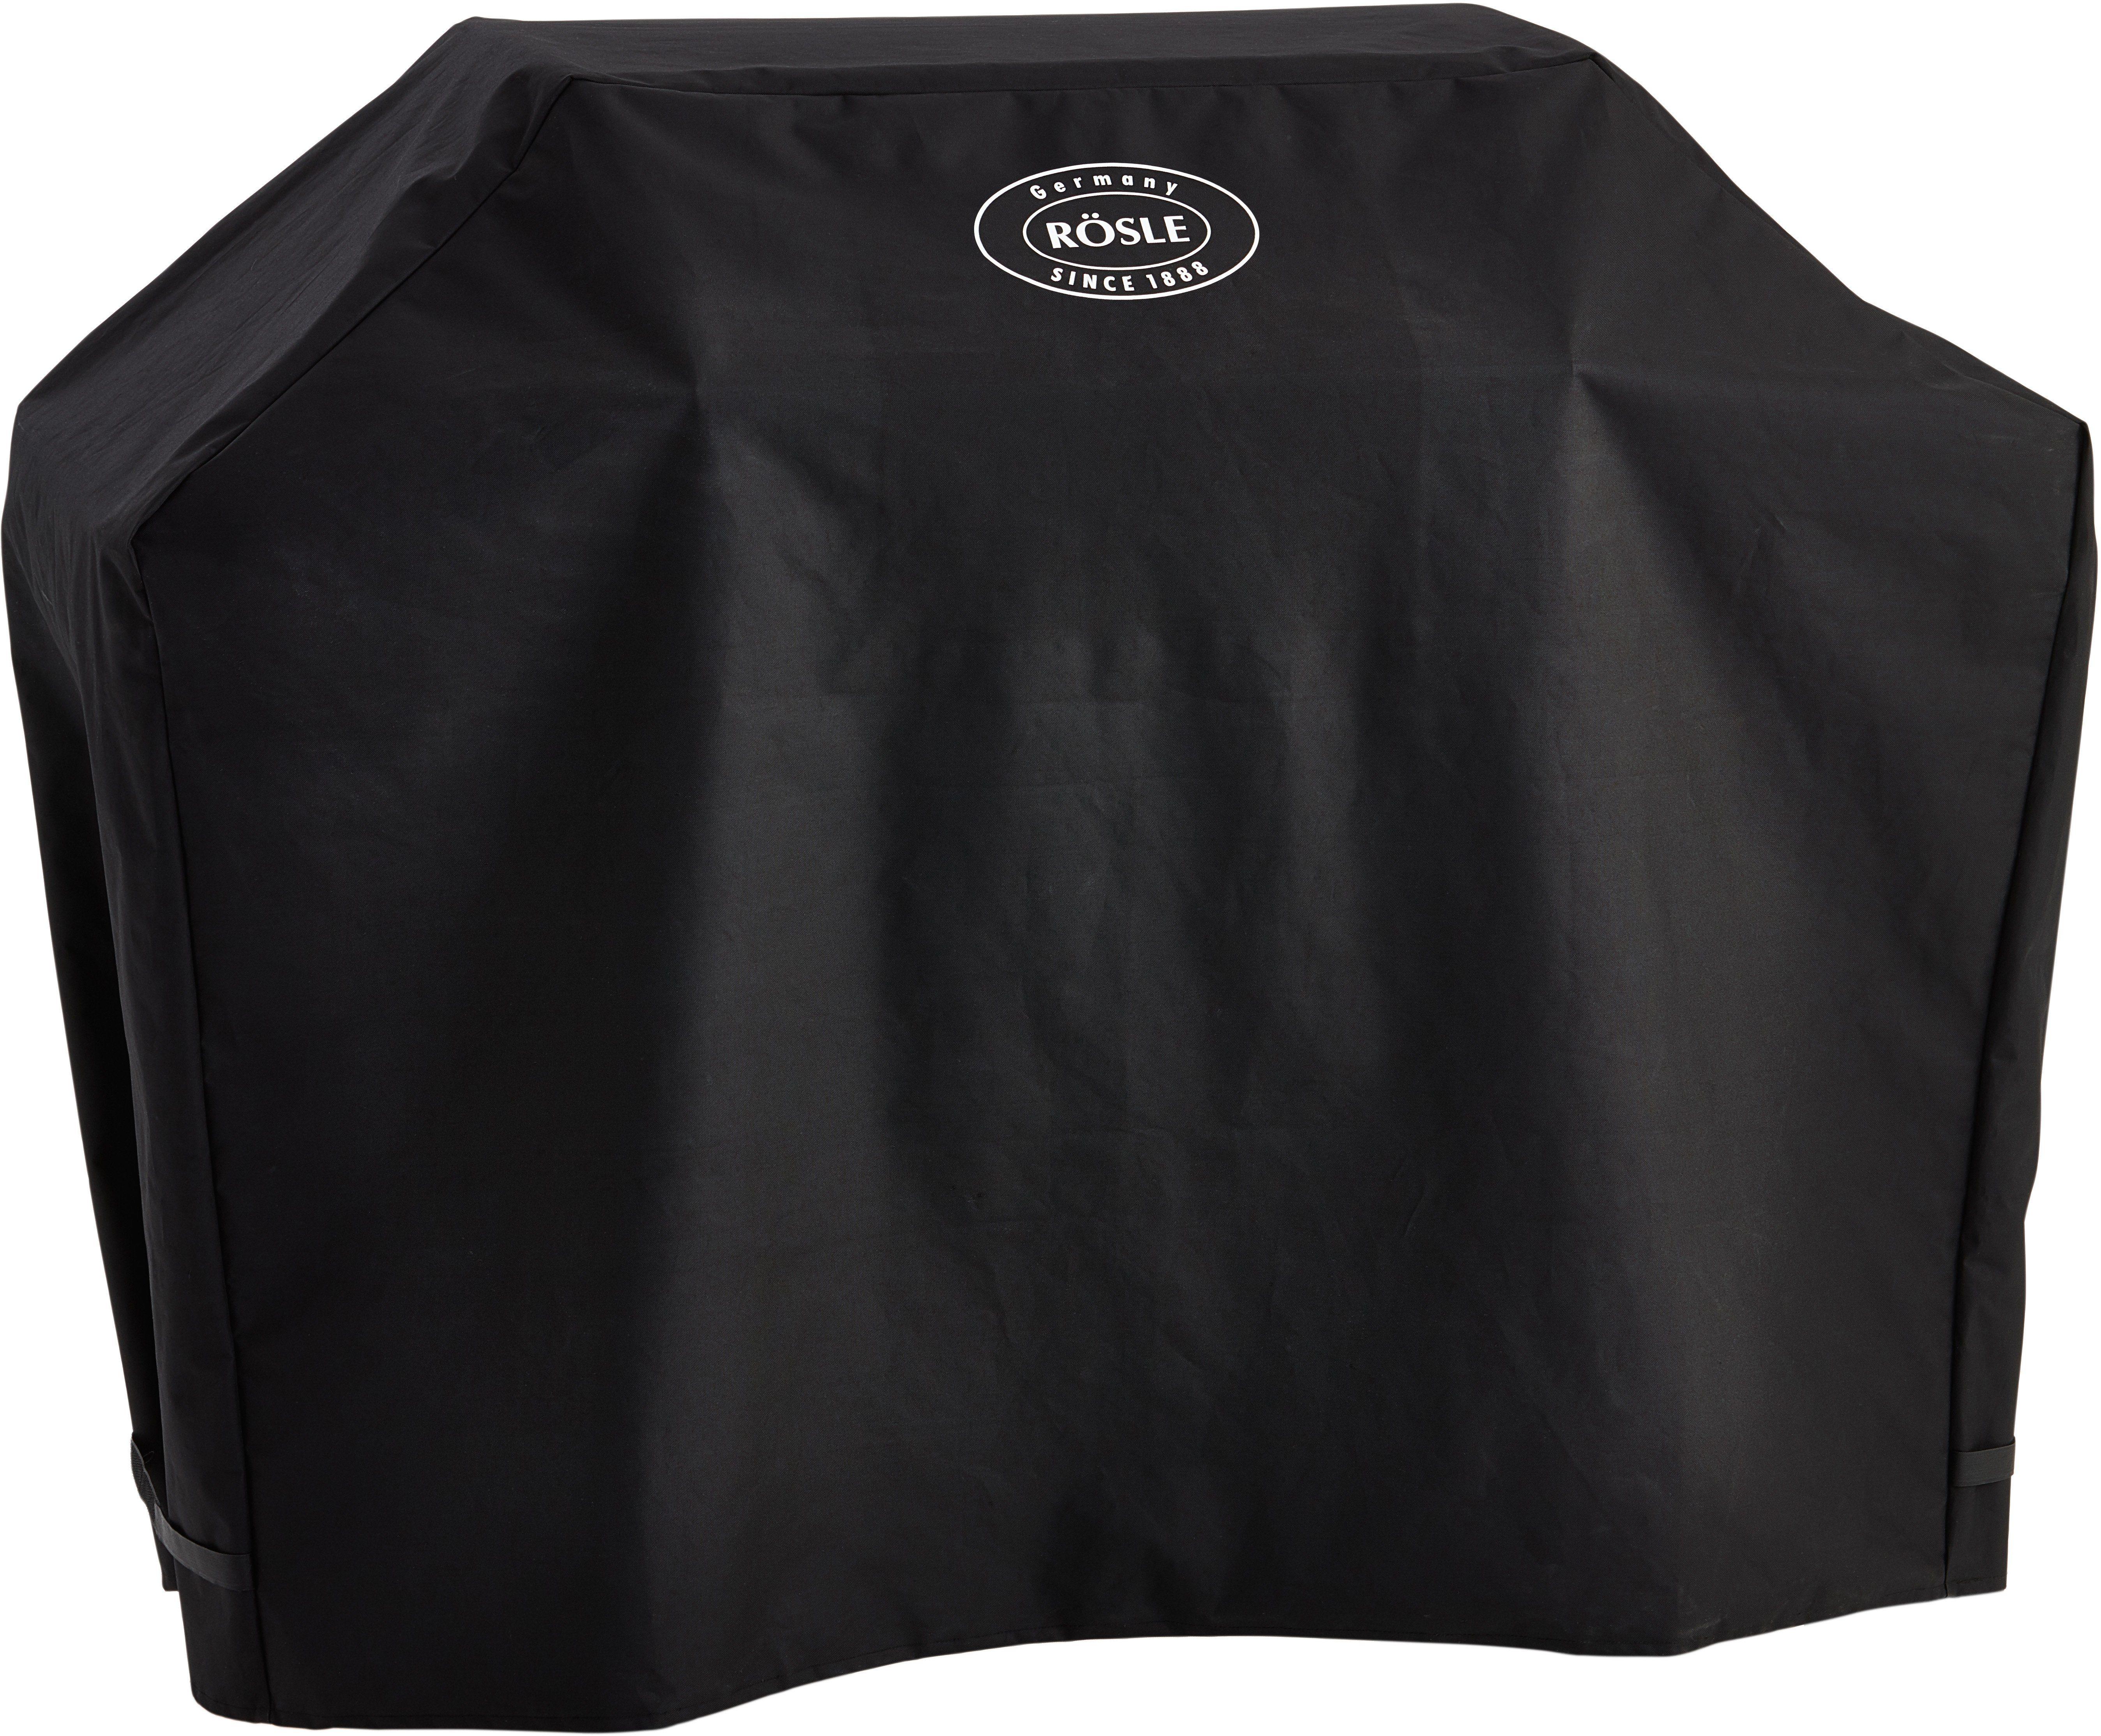 Rösle Gasgrill Sansibar G4 Grillfläche 70 45 Cm : Rösle grills online kaufen otto